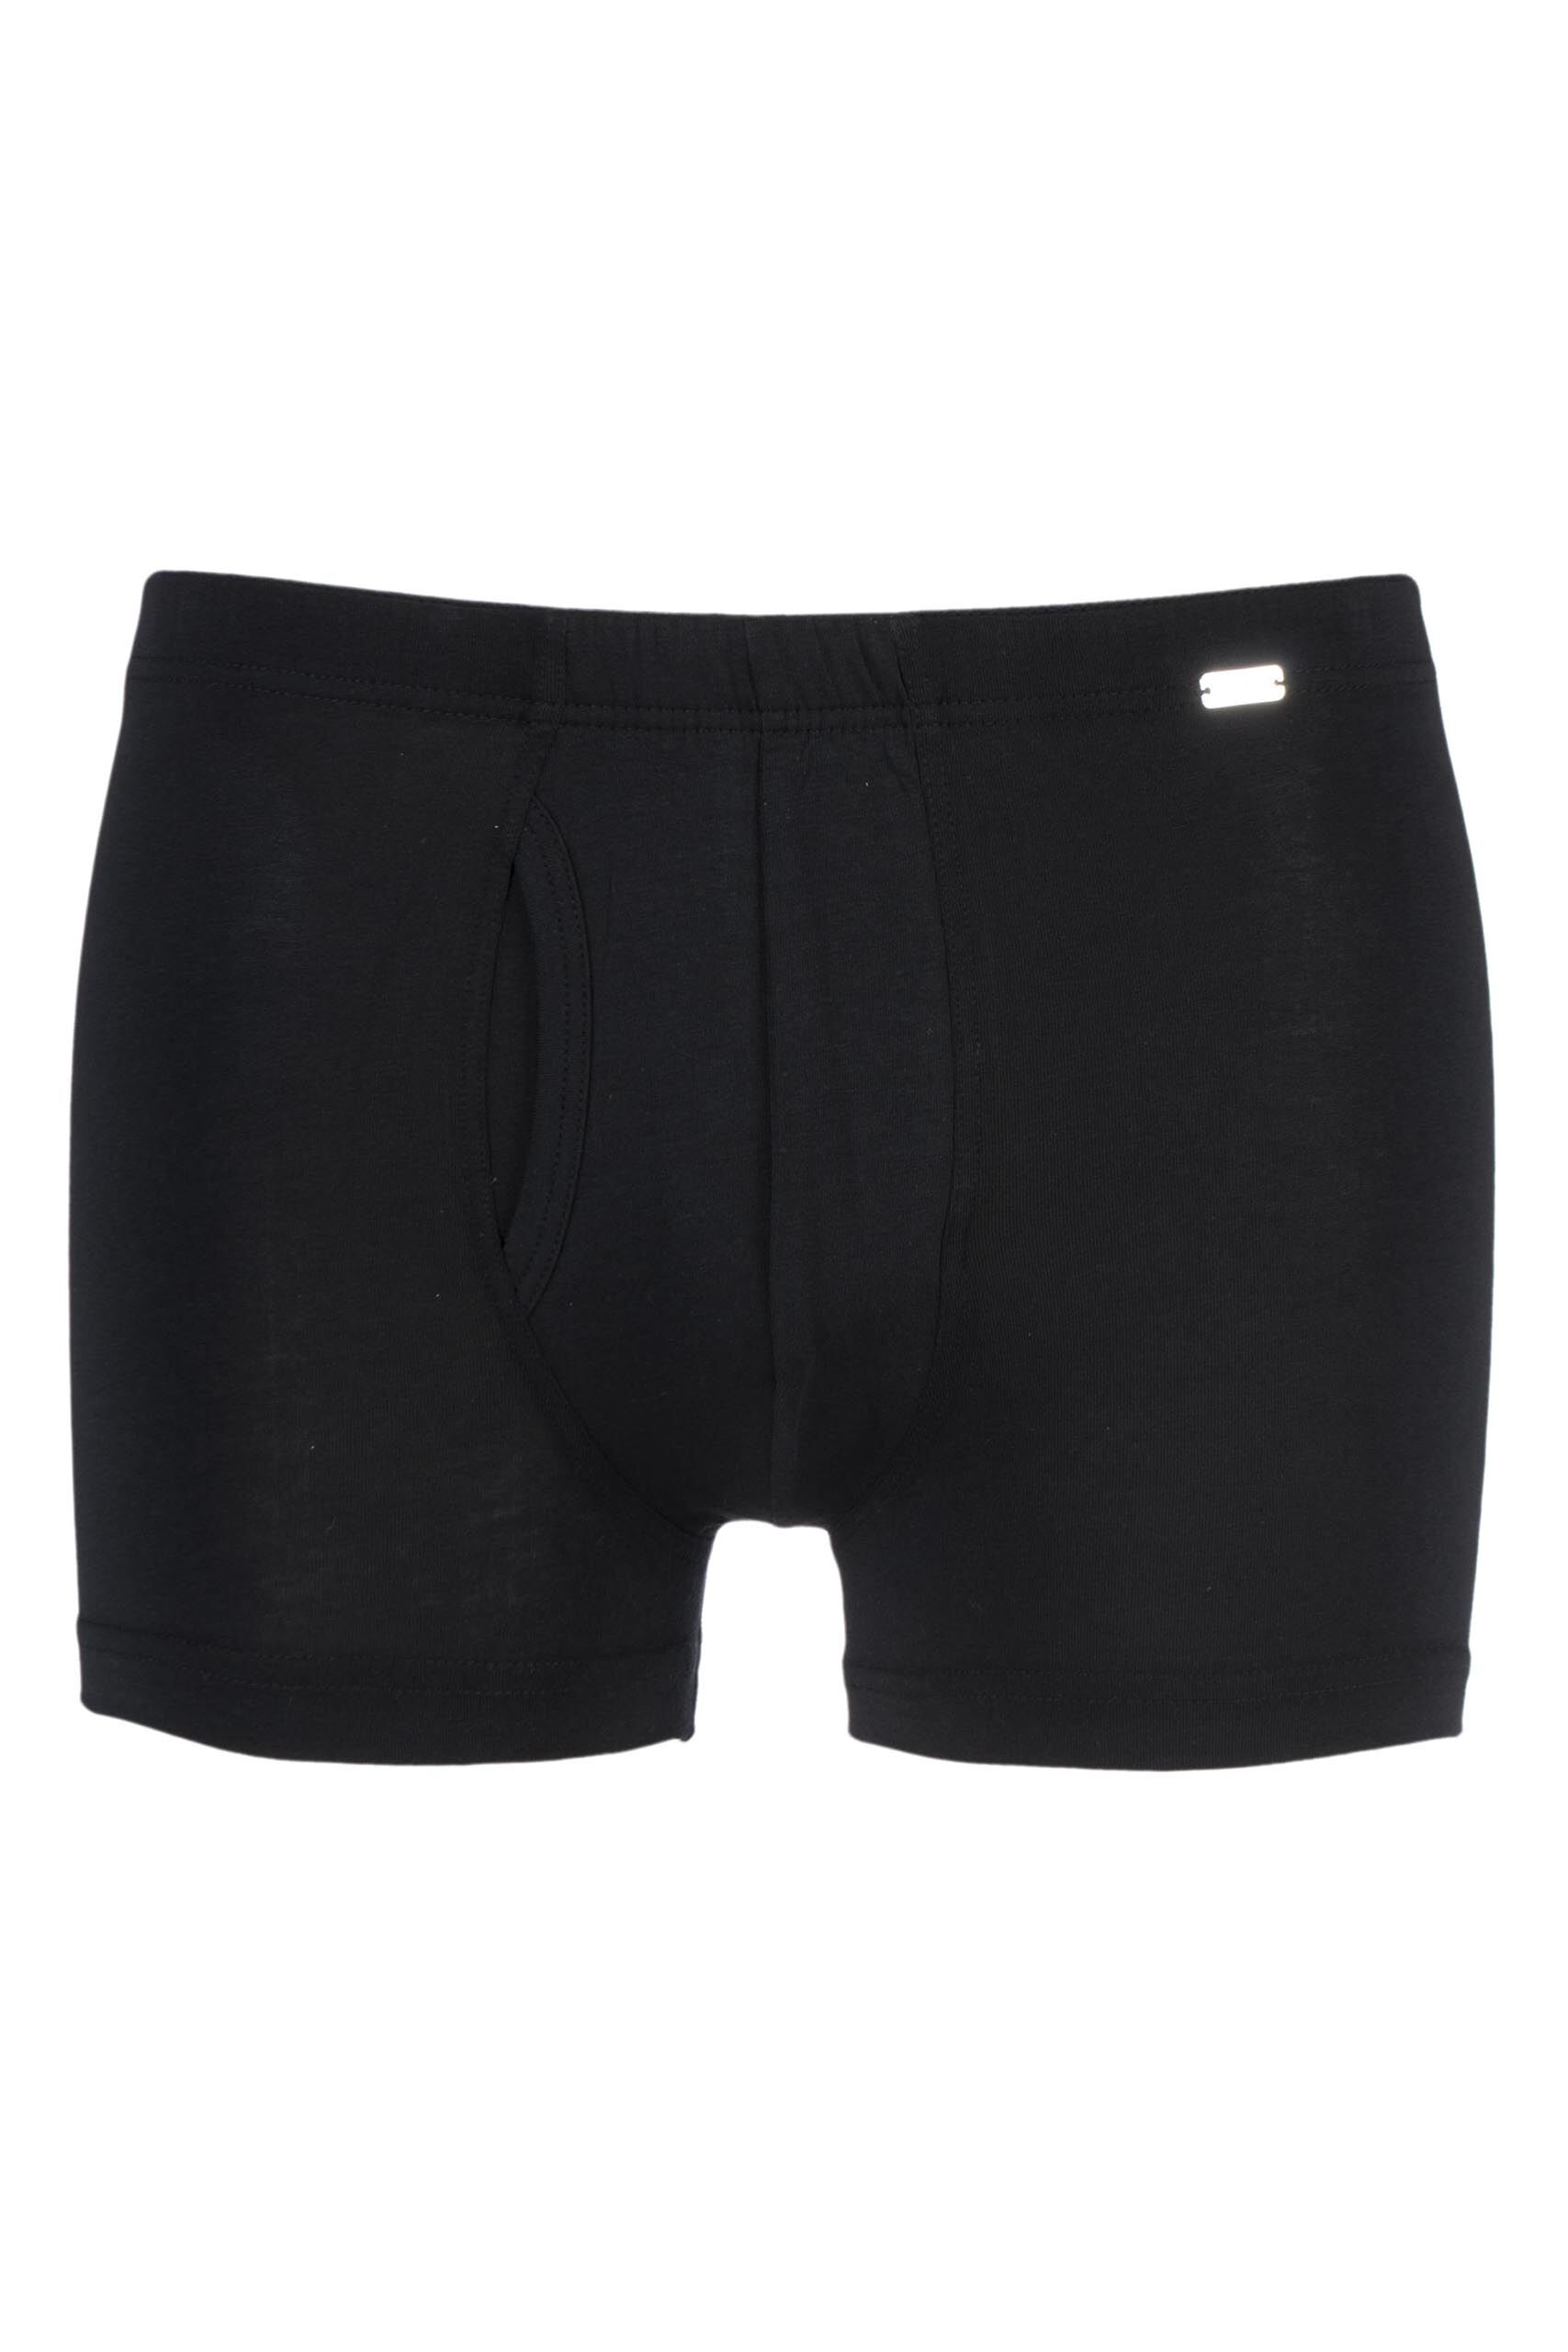 Image of 1 Pack Black Modern Stretch Comfort Trunks Men's Small - Jockey